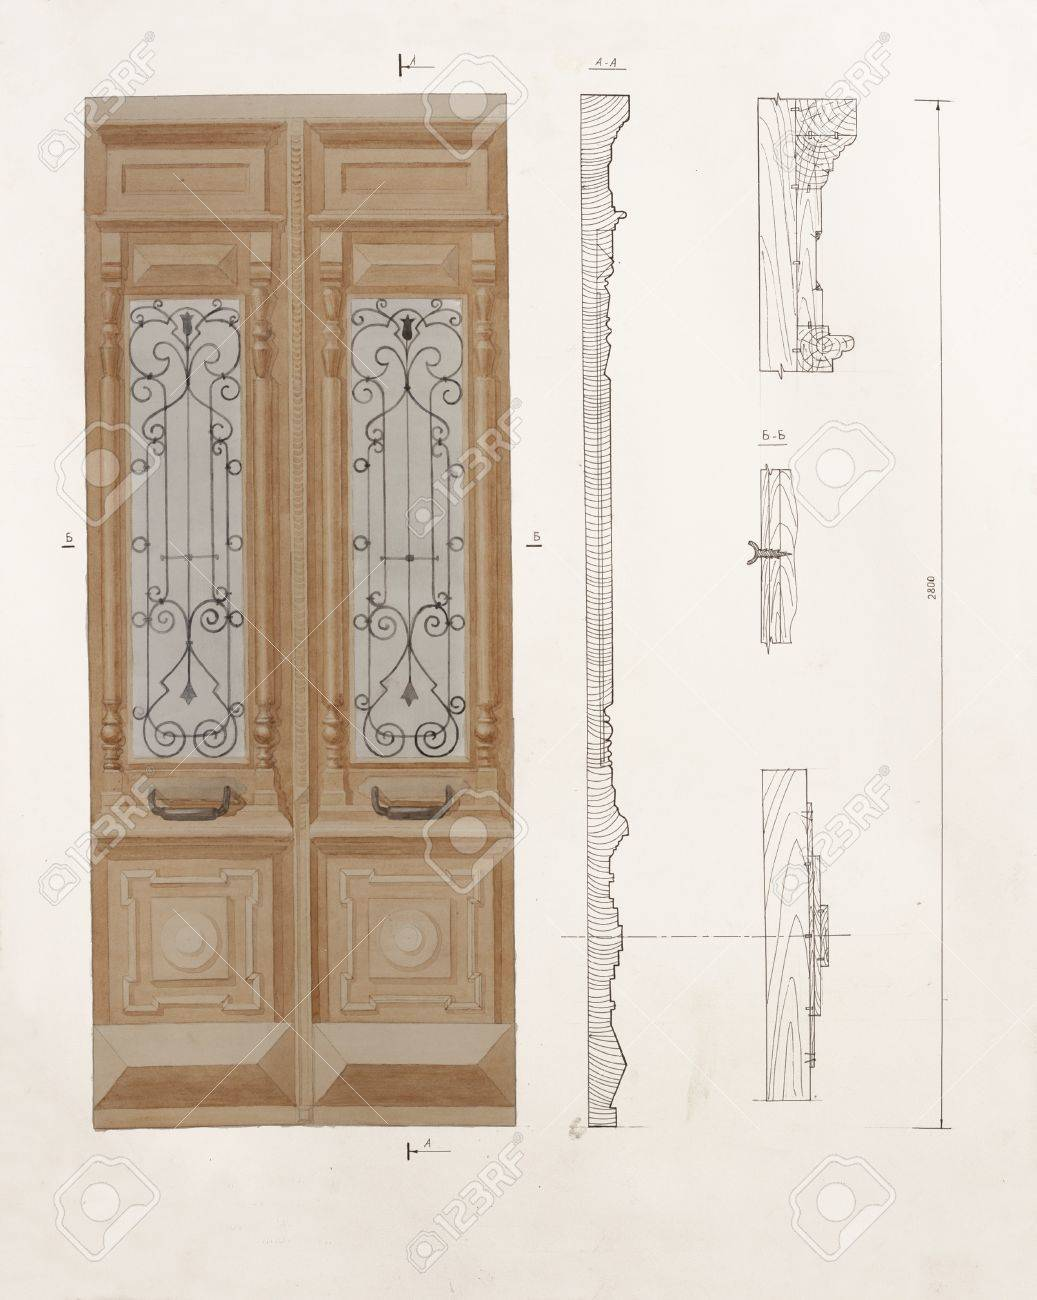 Door leaf drawing convention the location drawing joshua nava arts - Door Timber Dwg U0026 Detail